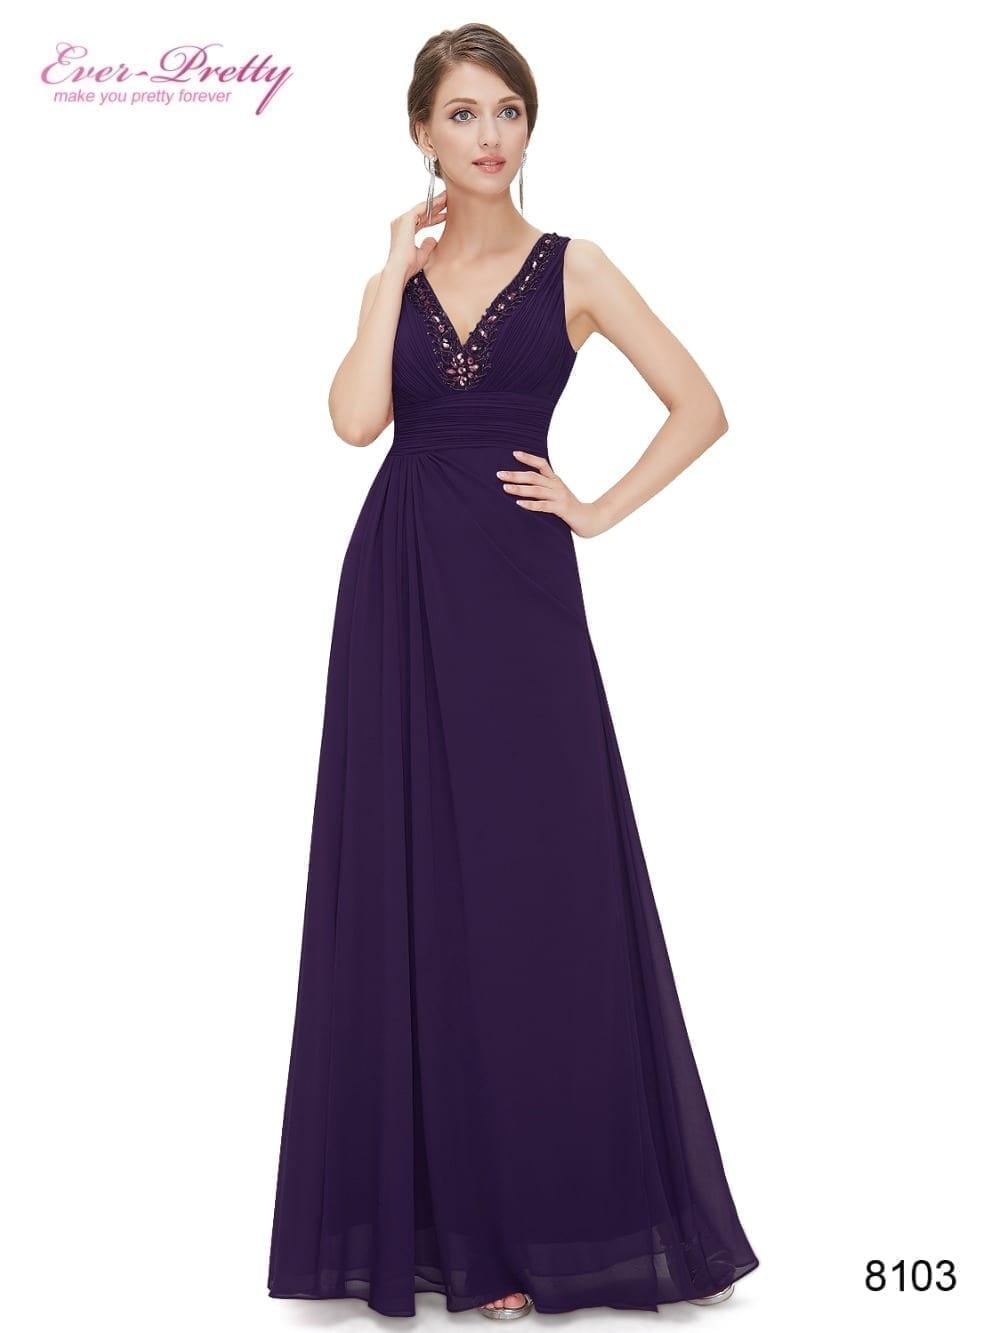 Double V-neck Rhinestone Long Elegant Chiffon Bridesmaid Dress